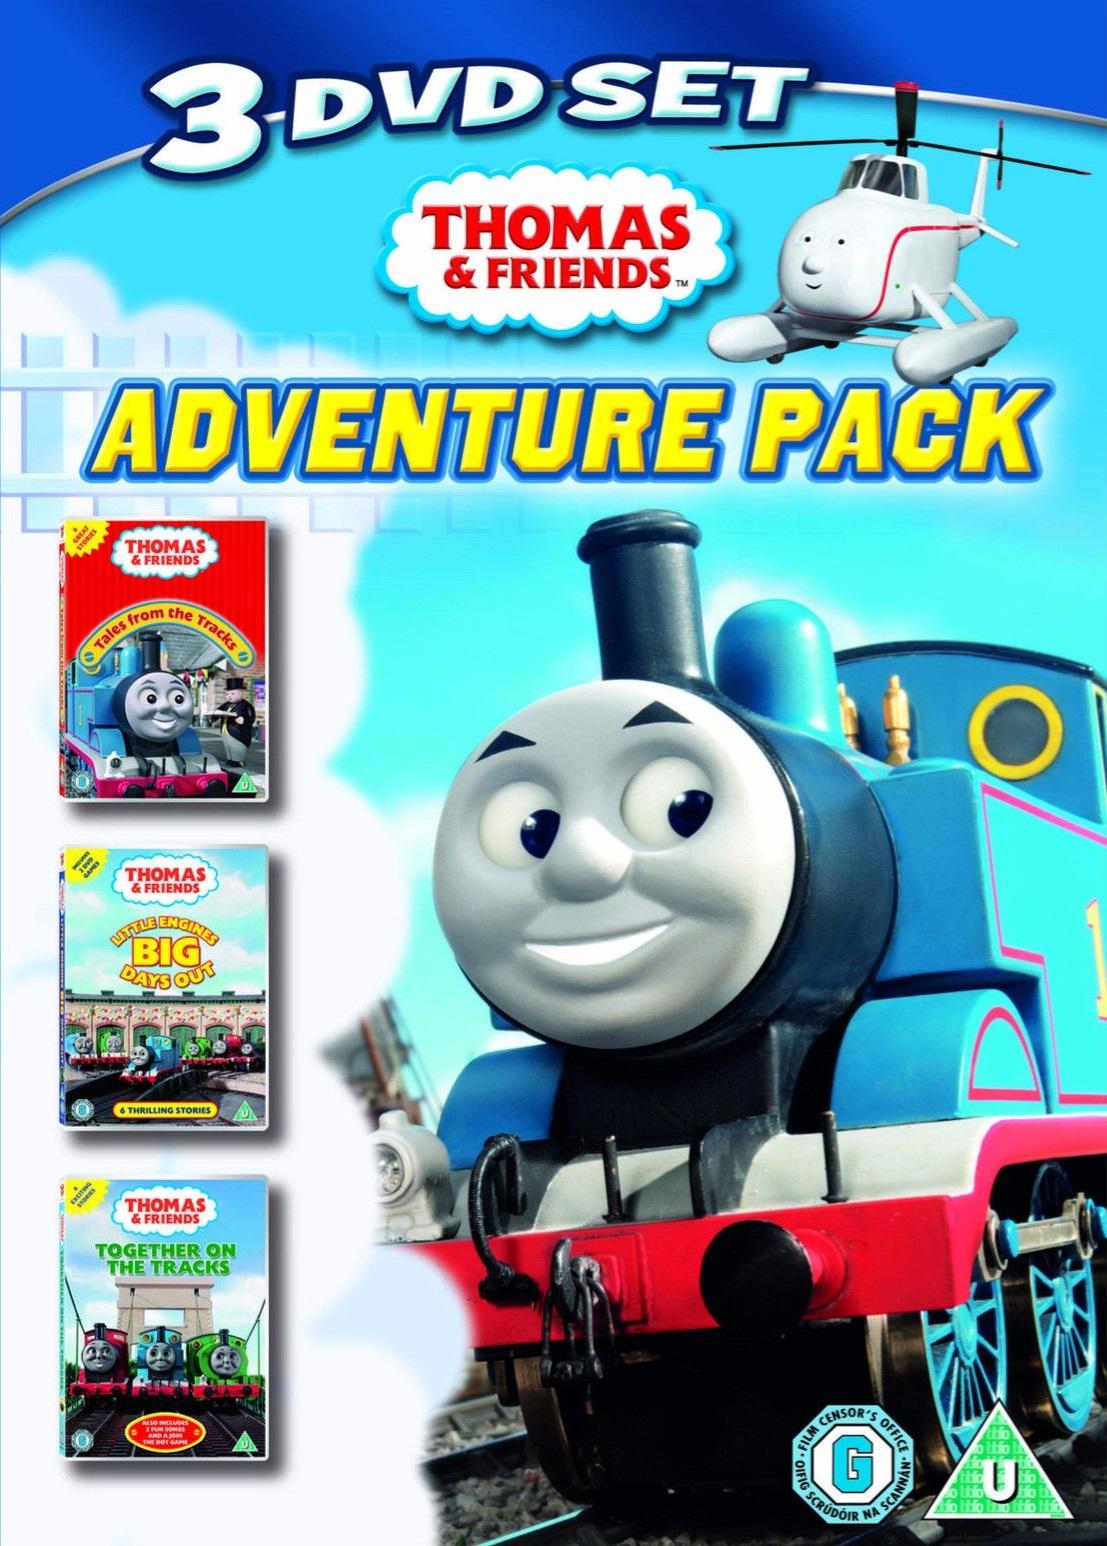 Adventure Pack (UK DVD)